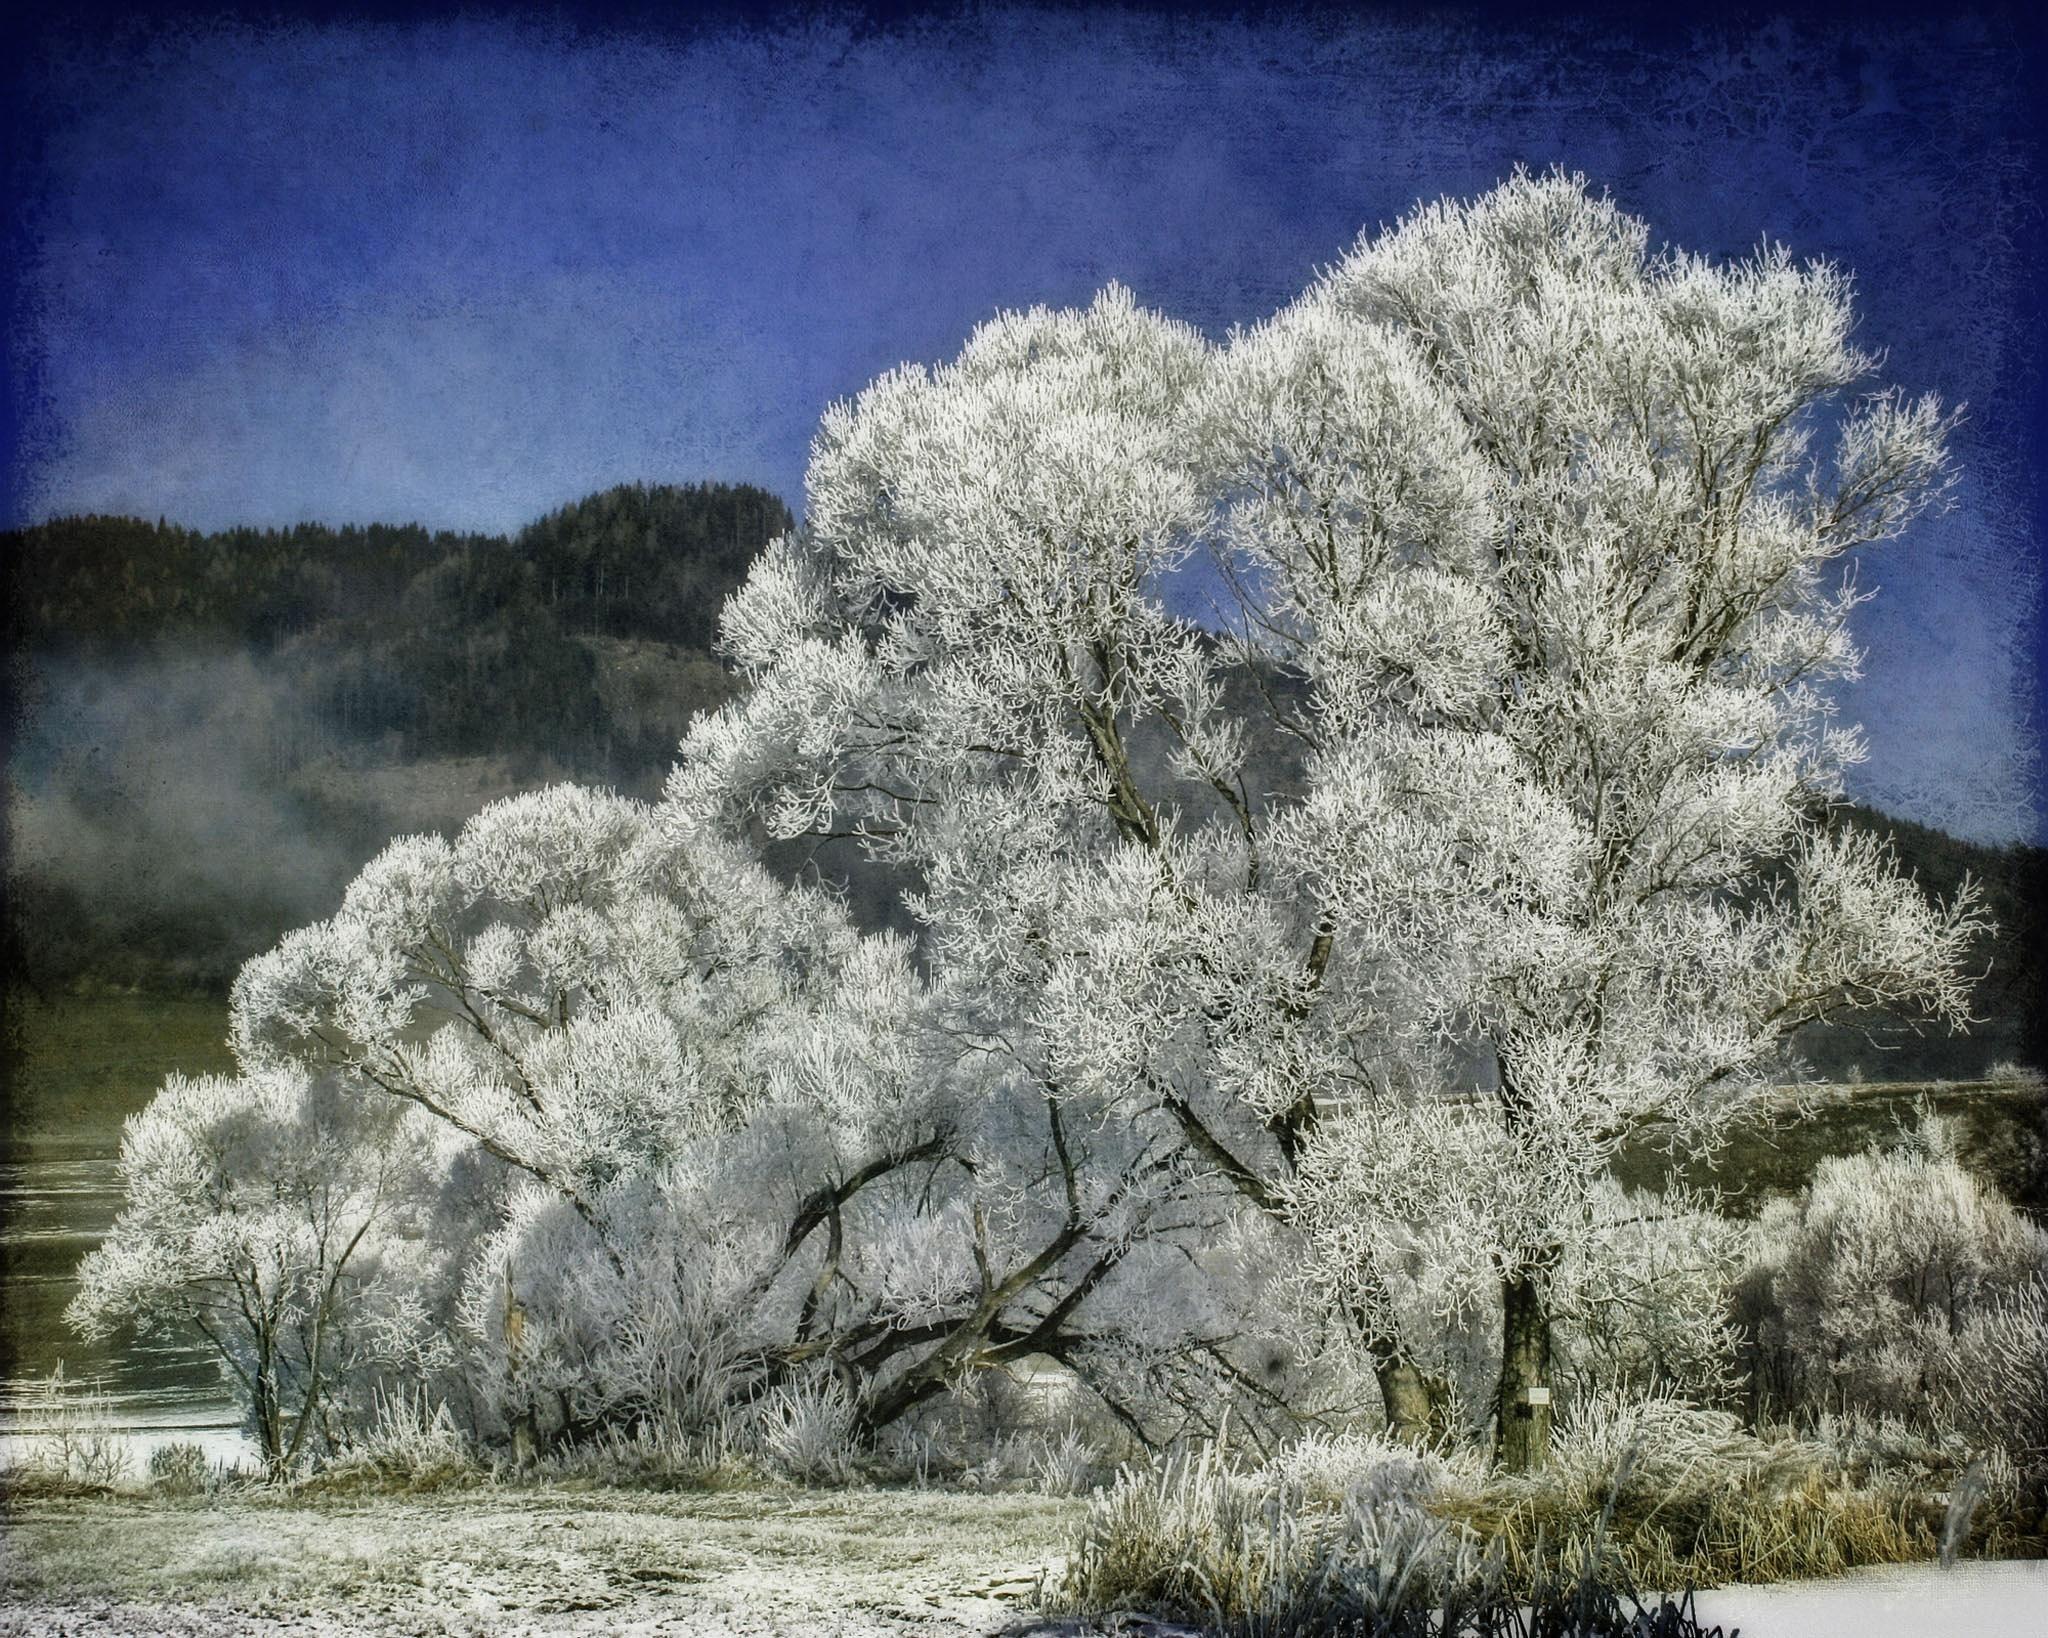 Frosty by regzech